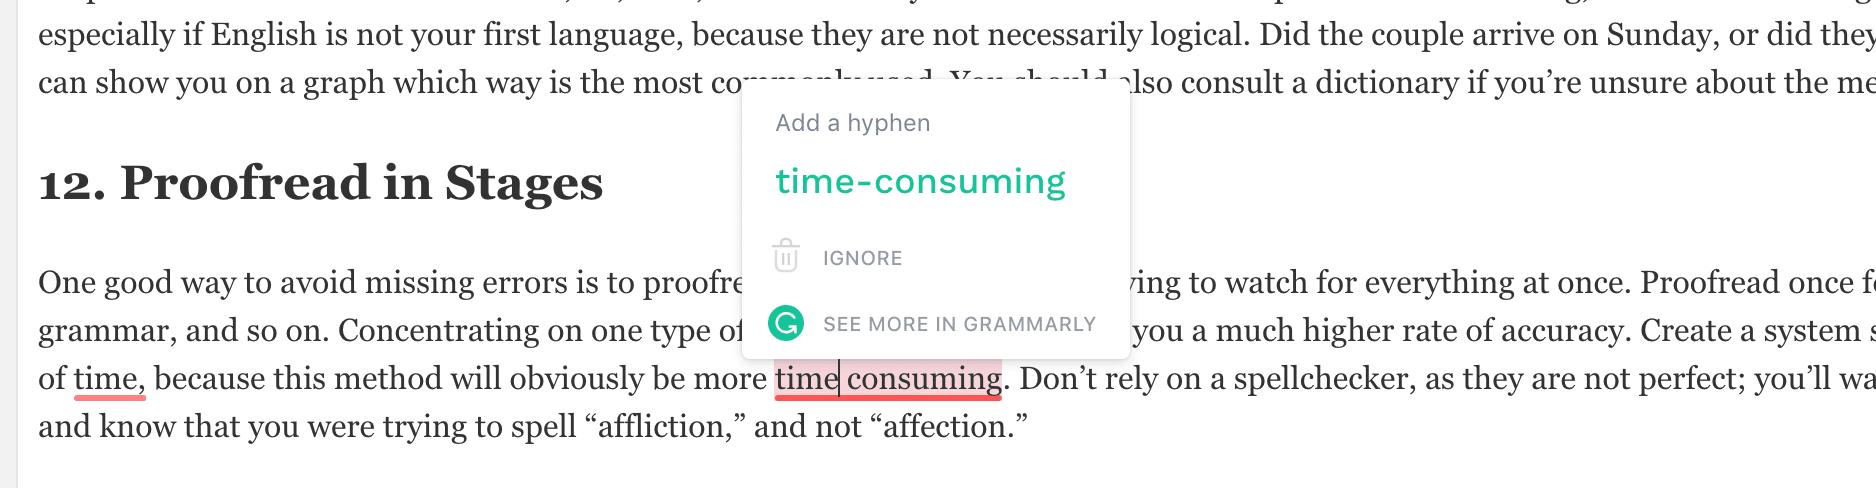 Exemple d'erreur grammaticale